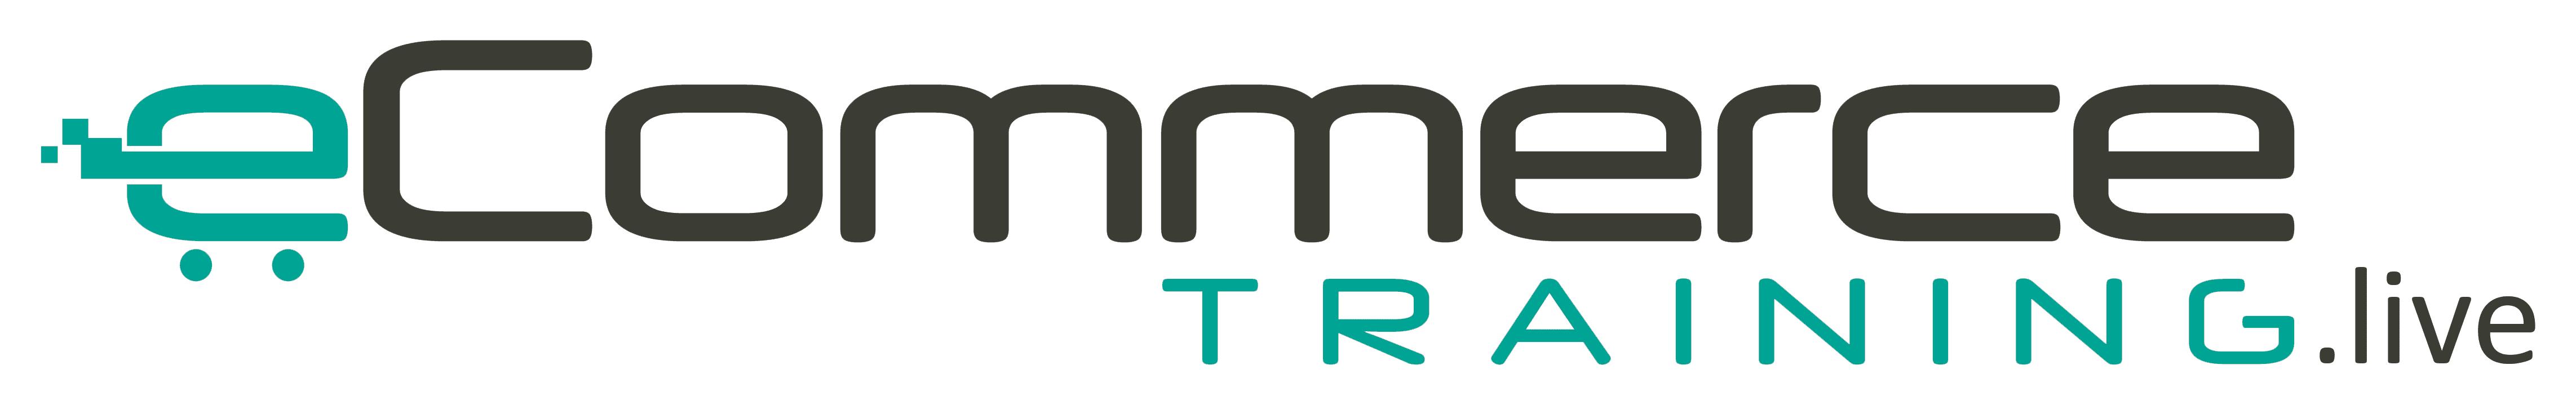 eCommerce Training Live